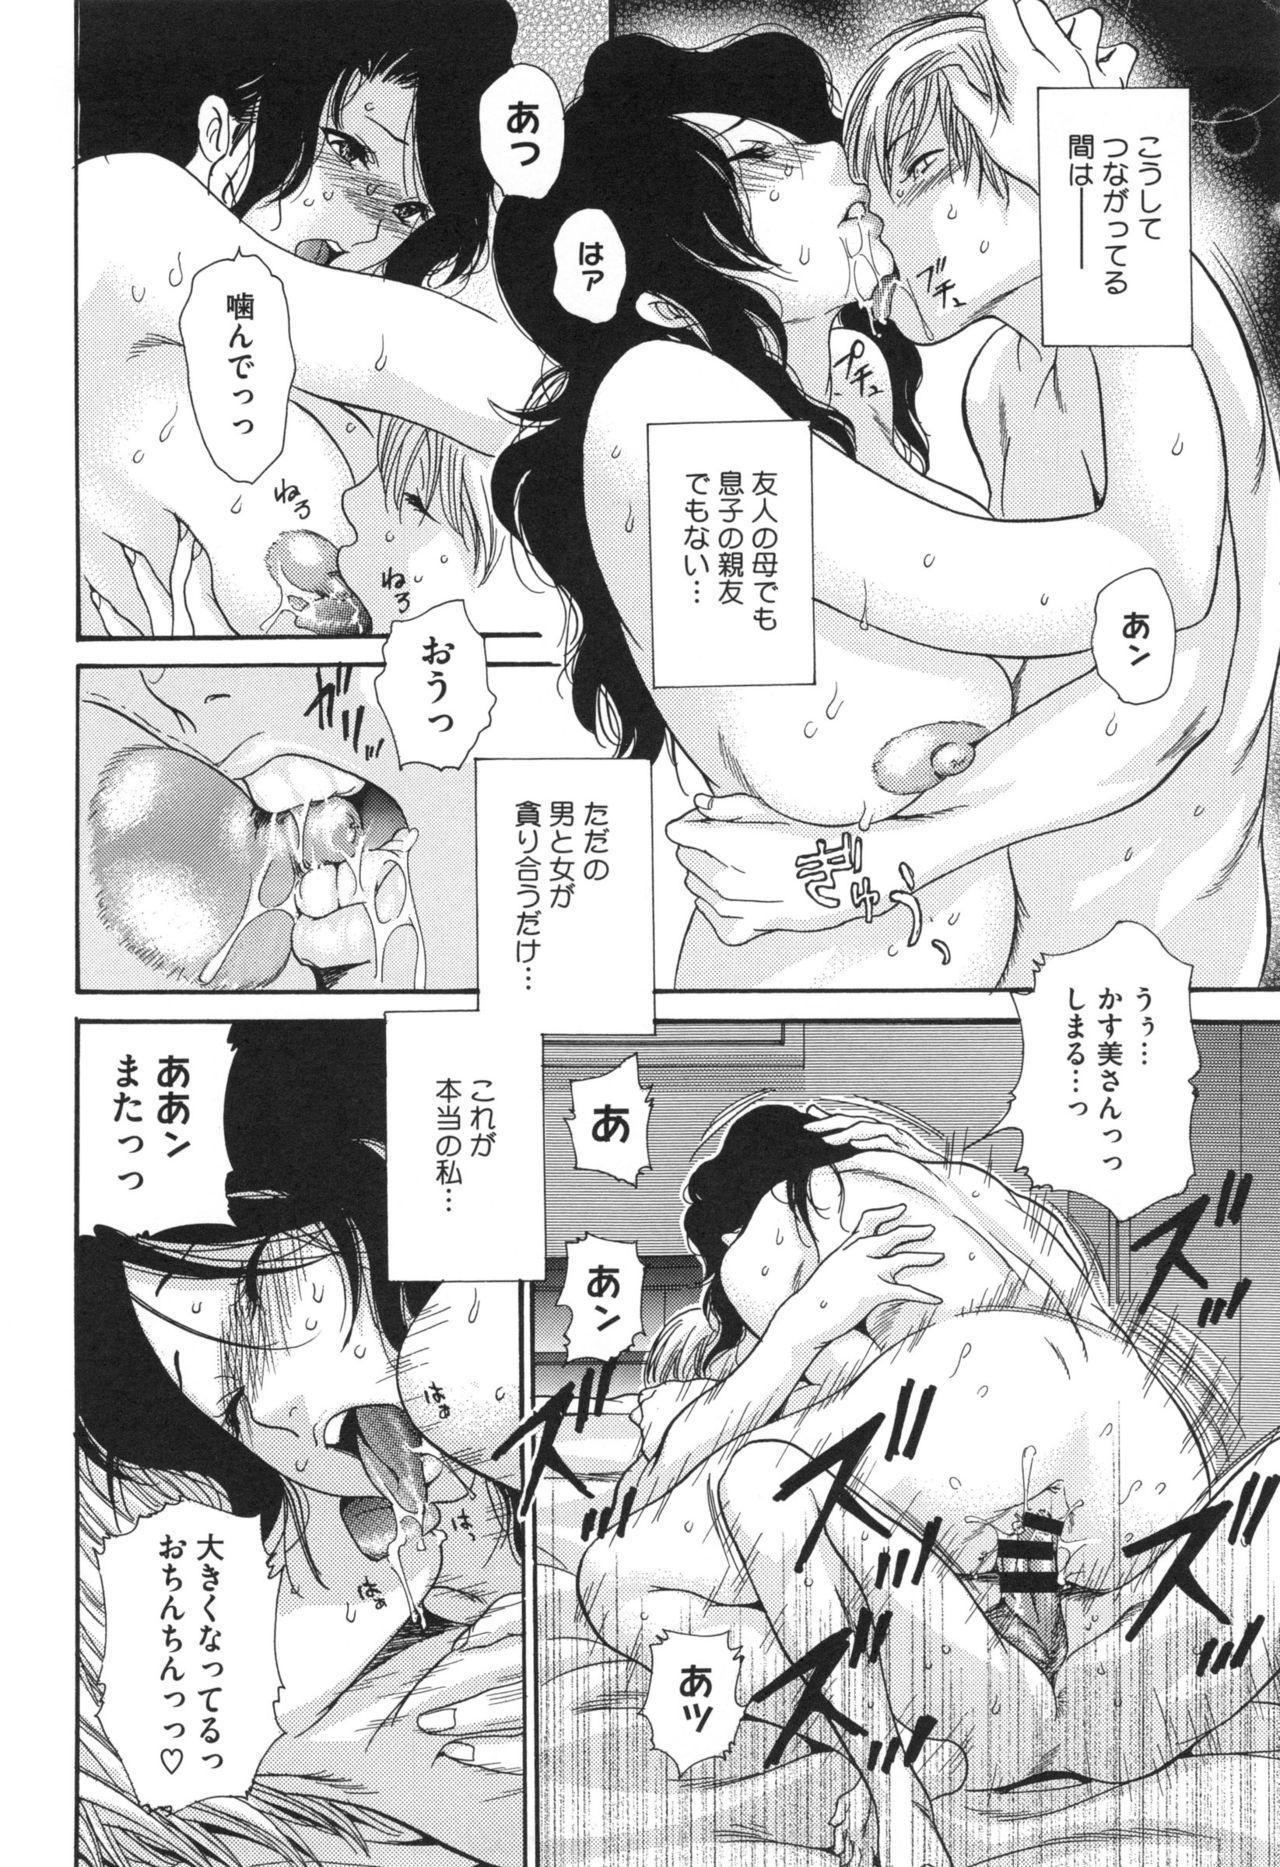 Niku-zuma Netorare Maniacs 86